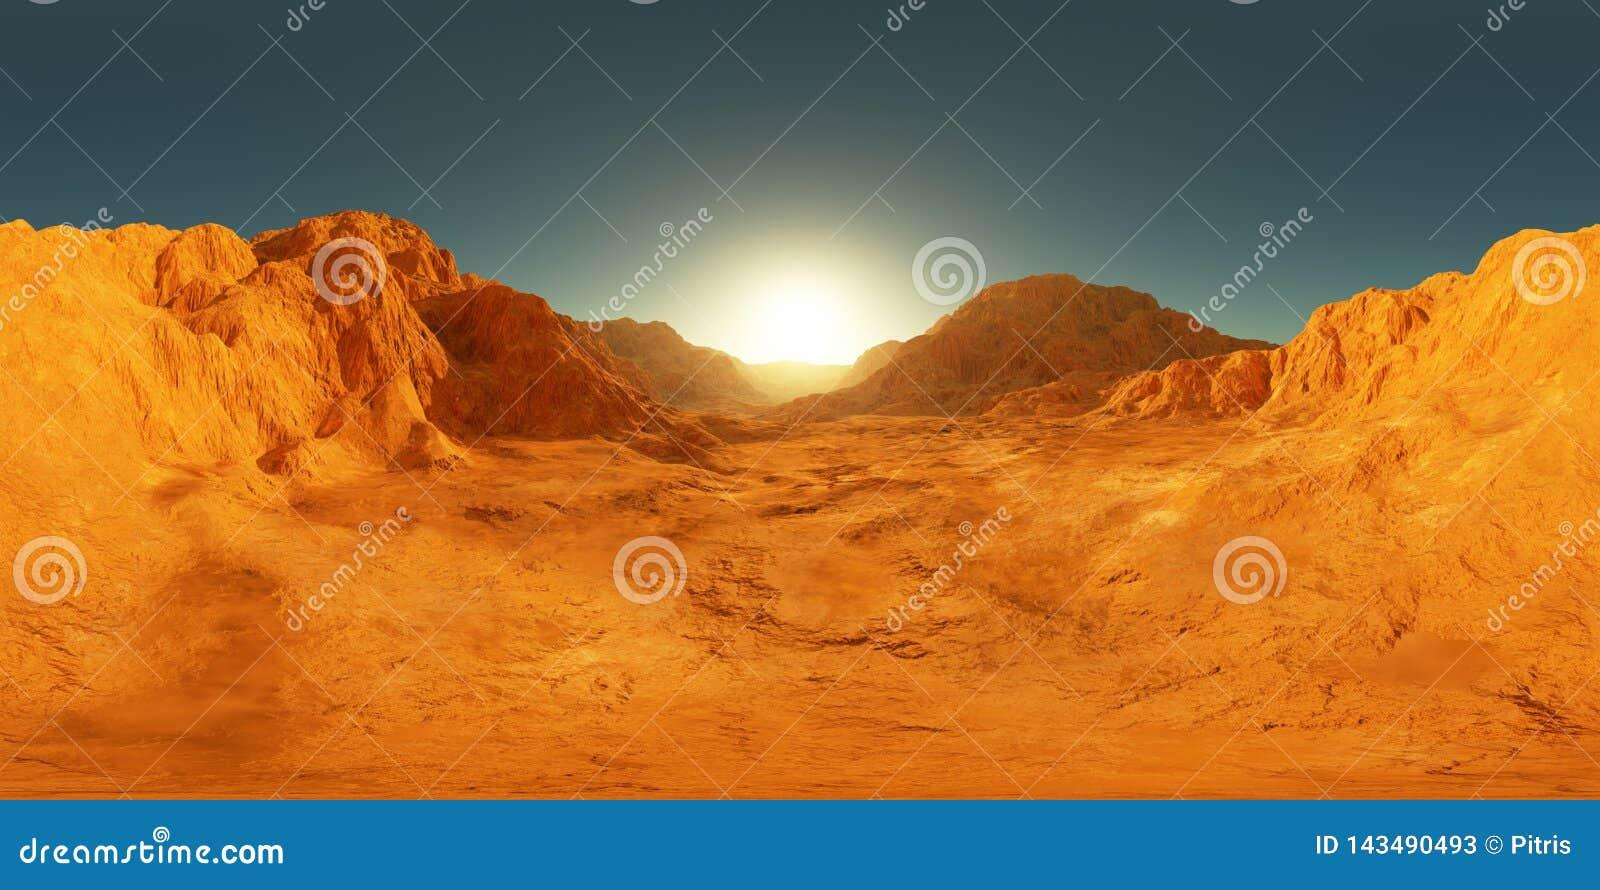 панорама 360 градусов захода солнца Марса, карты окружающей среды HDRI Проекция Equirectangular, сферически панорама Марсианский